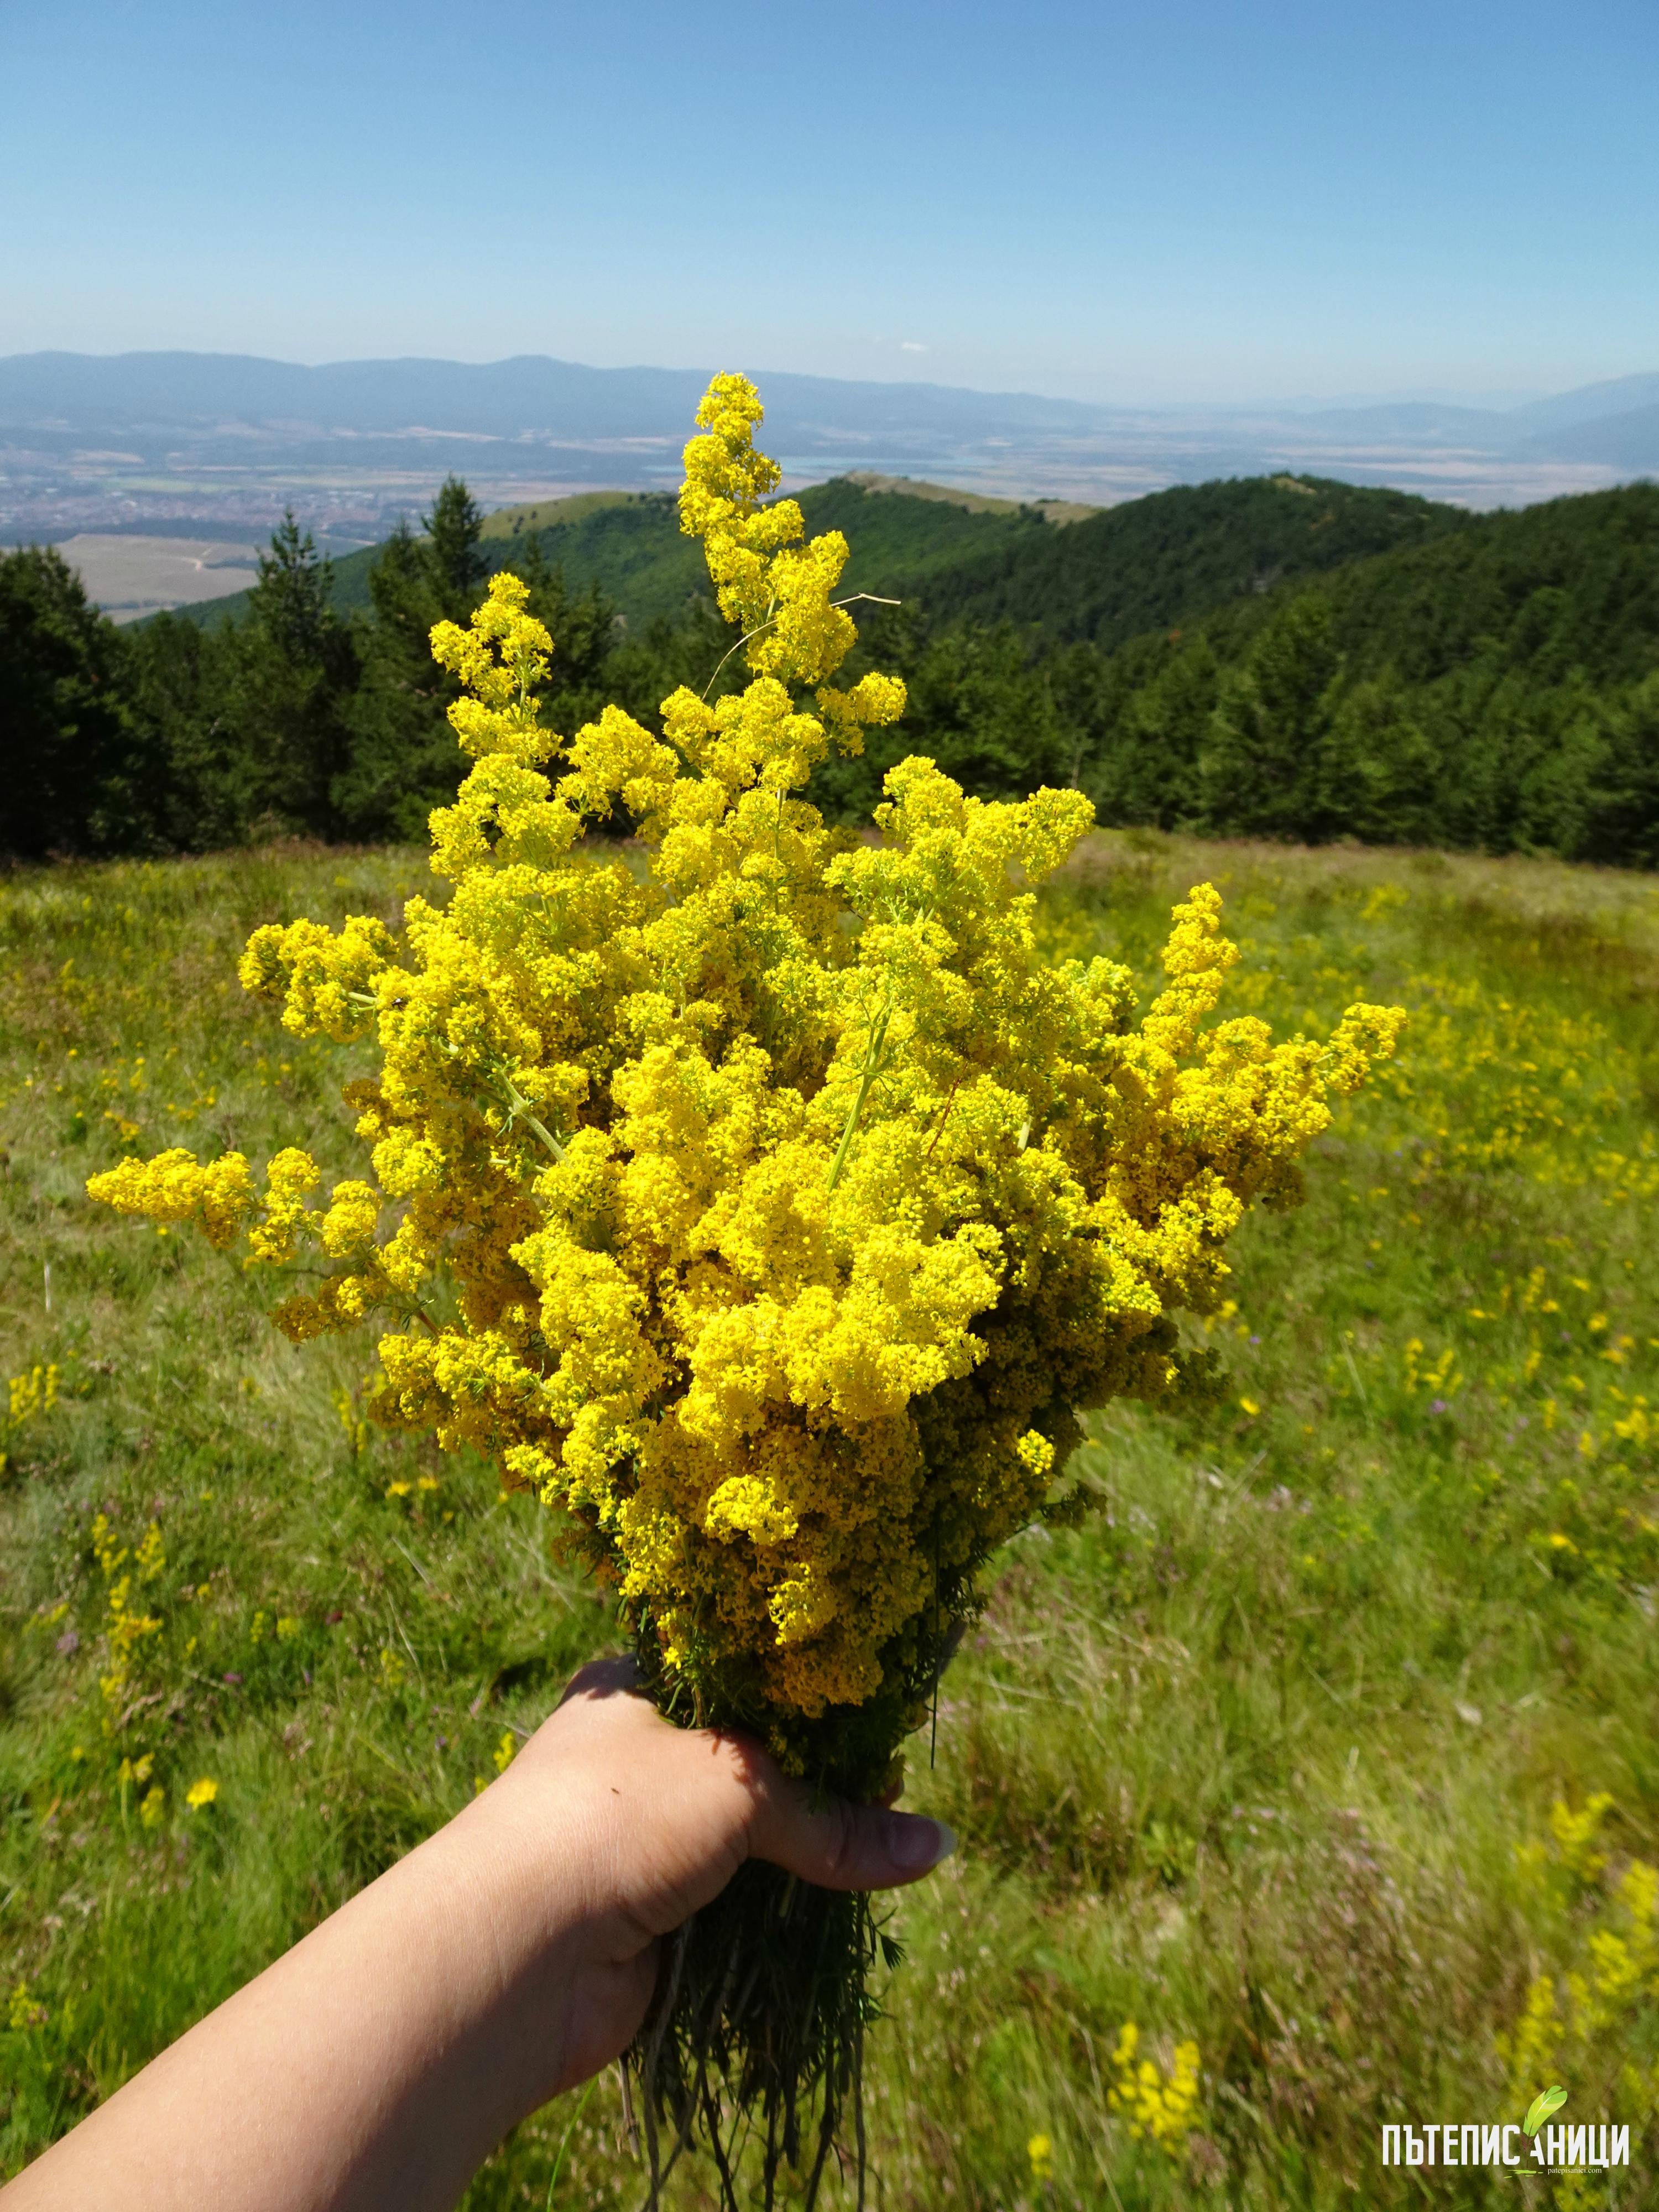 Саръяр, връх, Жълти бряг, Стара планина